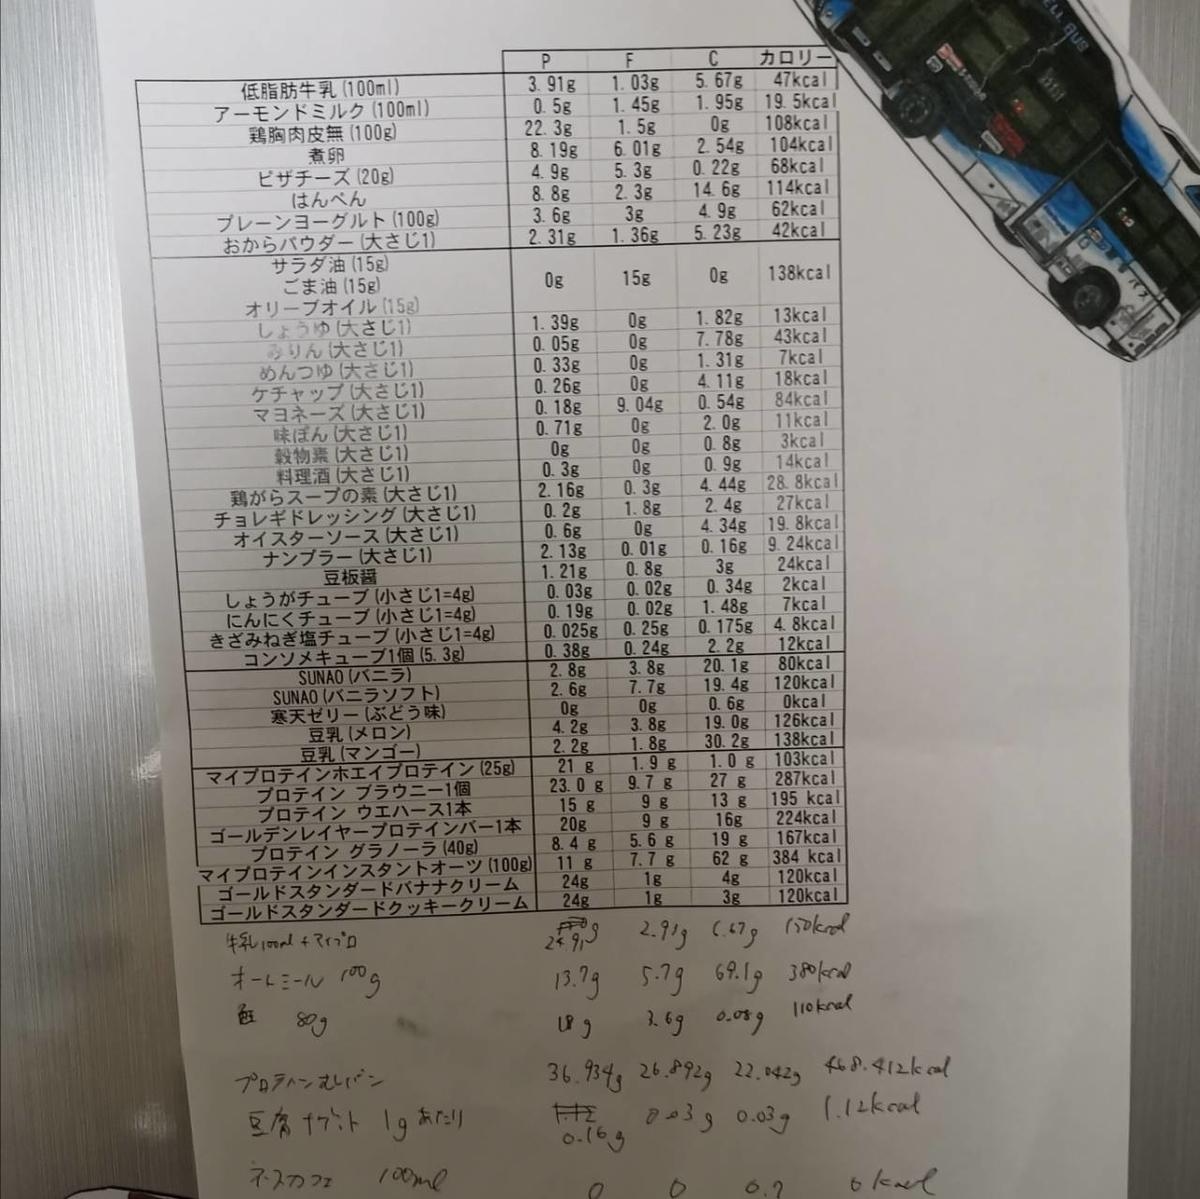 f:id:kurokichidesu:20200610104937j:plain